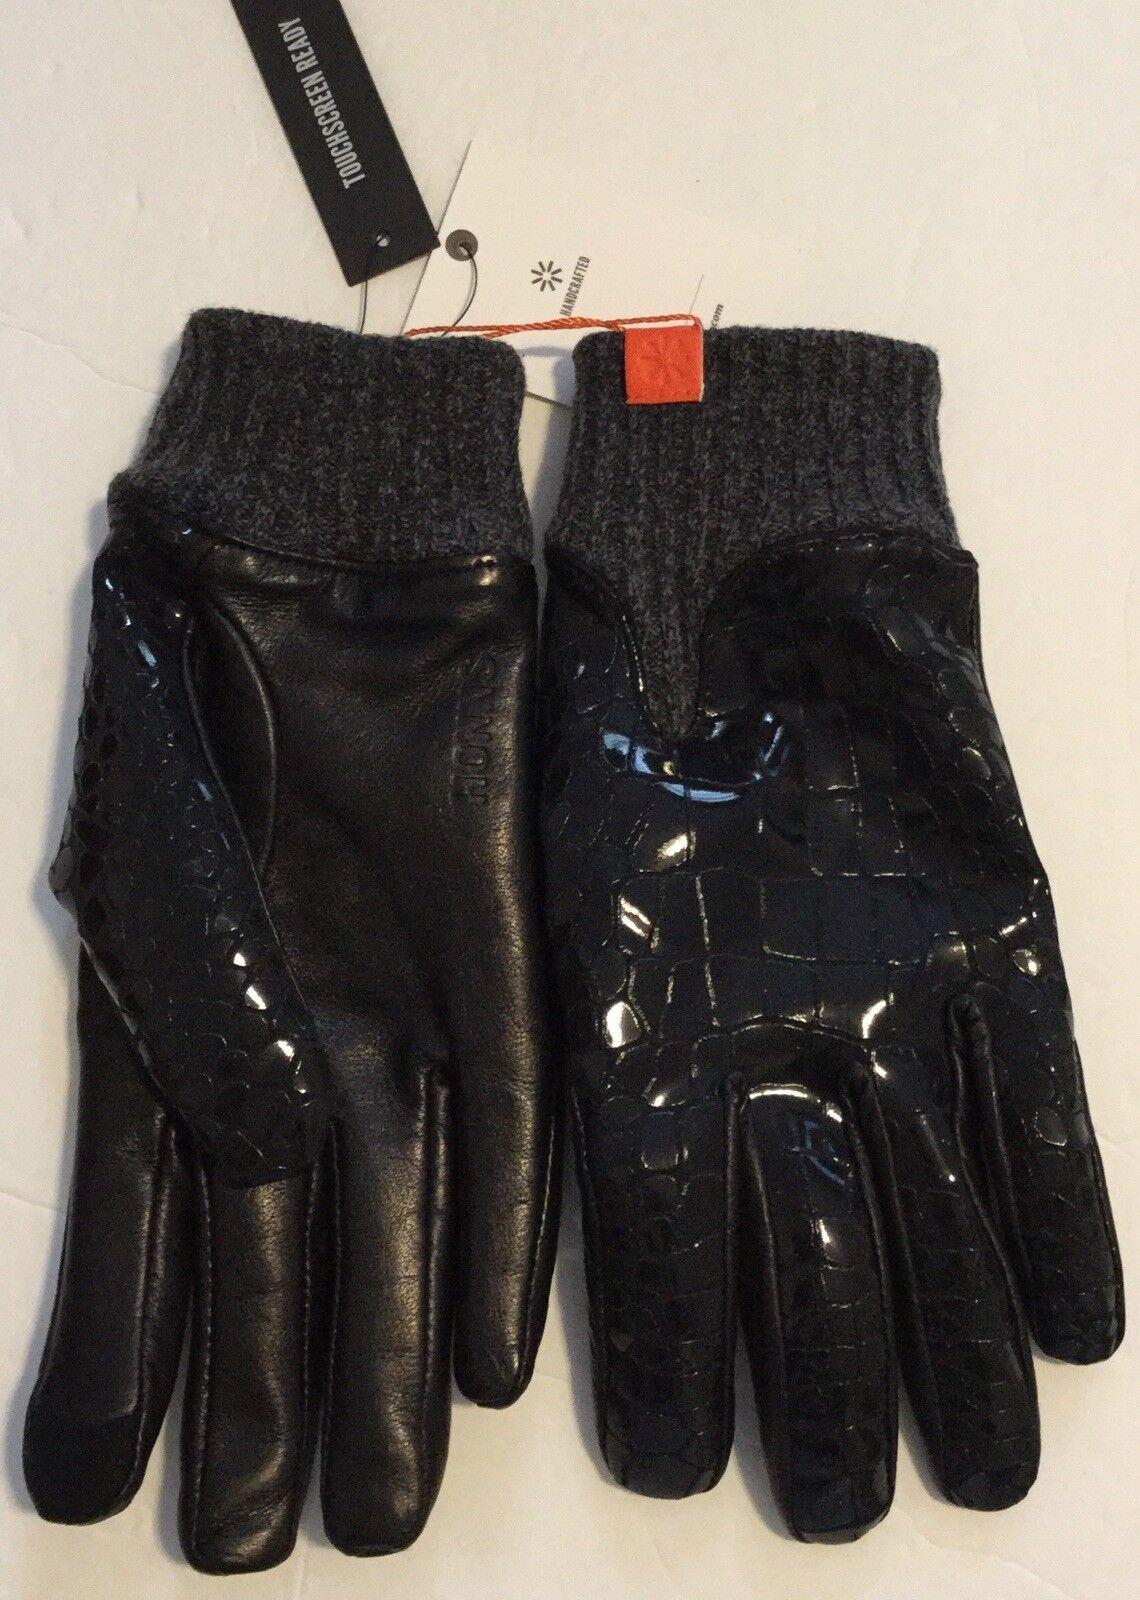 Honns Mens Leather Gloves Black Patent Noir Touchscreen Size Large 10 Logan Wool